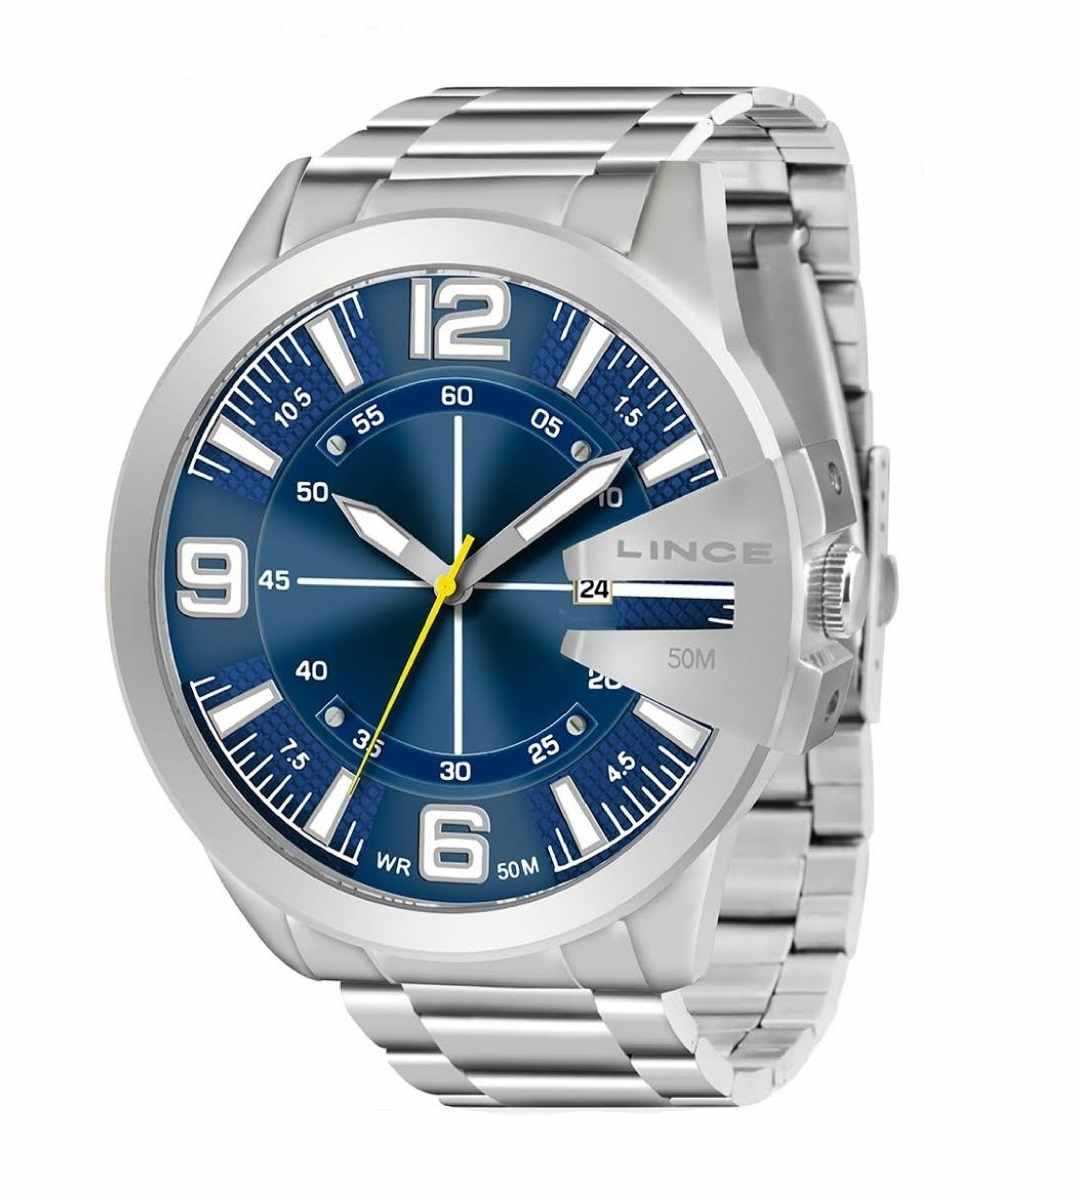 Relógio Lince Masculino Analógico Prateado Fundo Azul MRM4333L D2SX